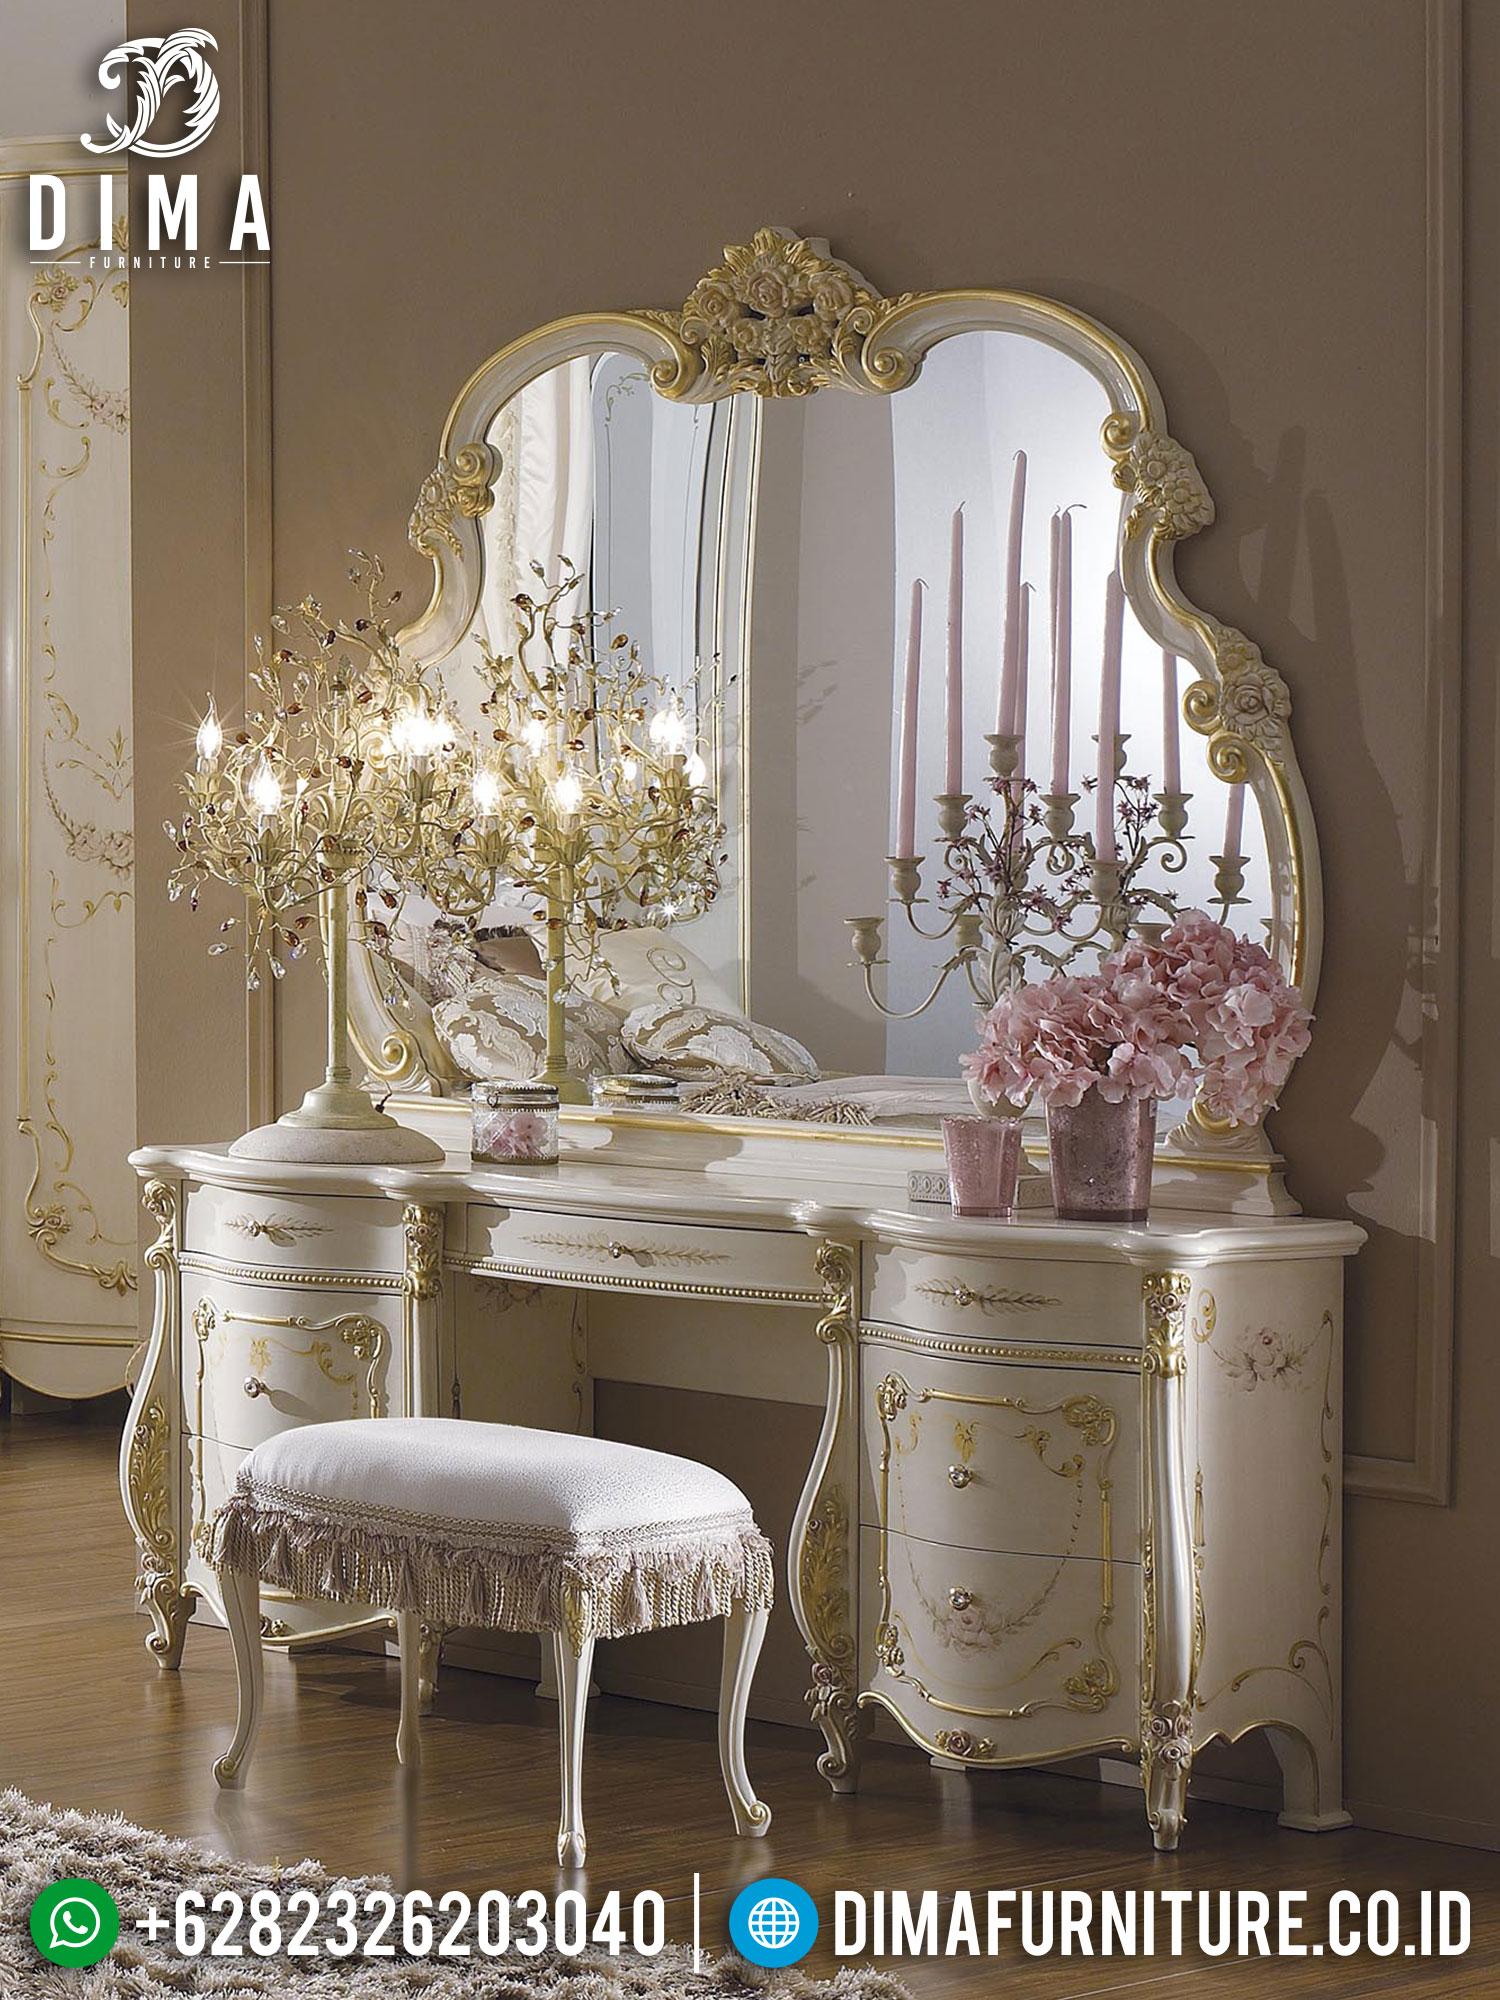 Meja Rias Mewah Ukiran Jepara Classic Luxury Design Best Sale ST-1333